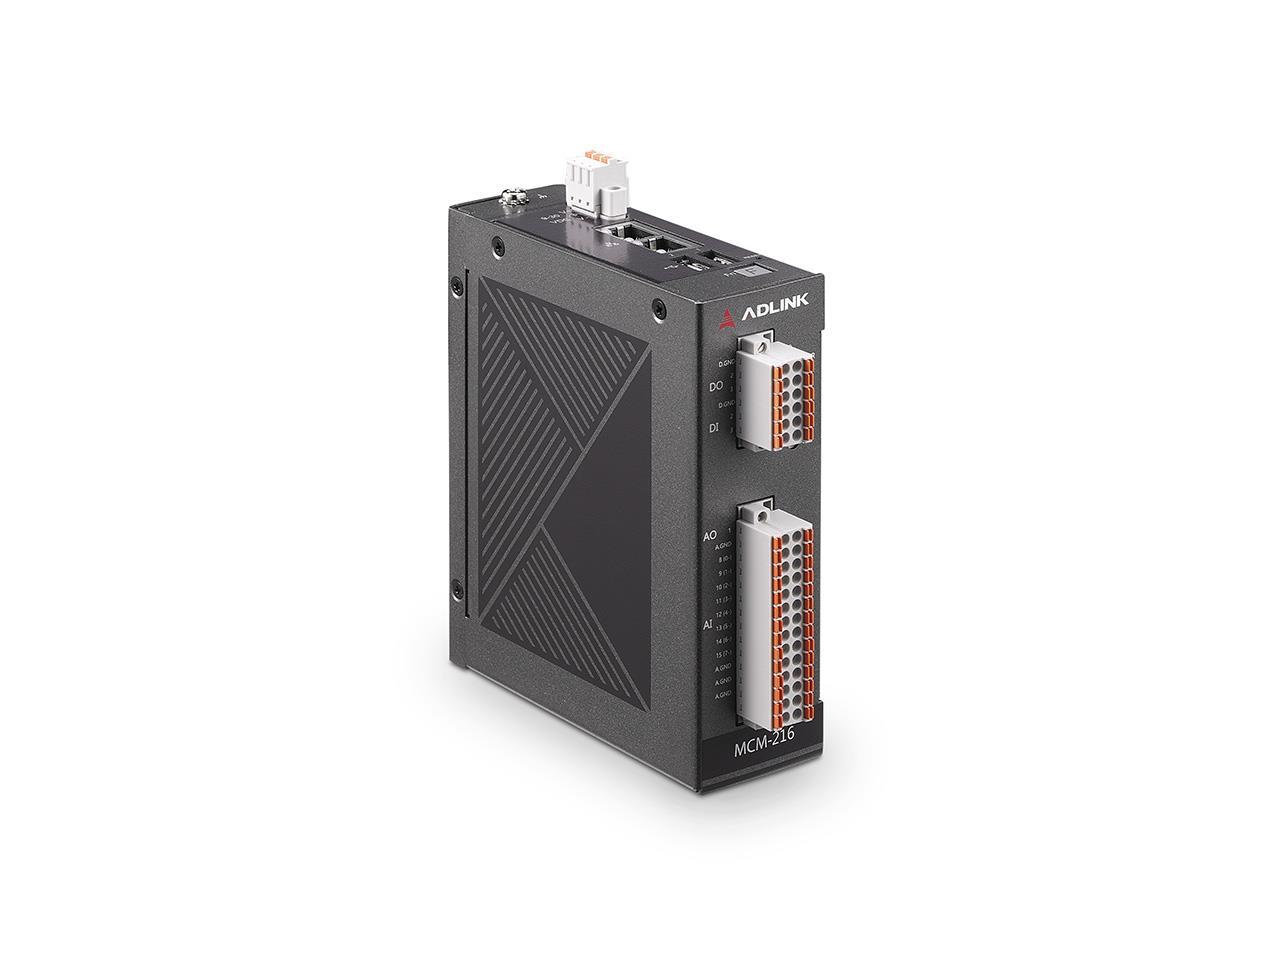 MCM-216/ MCM-218<br />Standalone Ethernet DAQ with 8/16-ch AI, 16-bit, 250kS/s, 4-ch DI/O